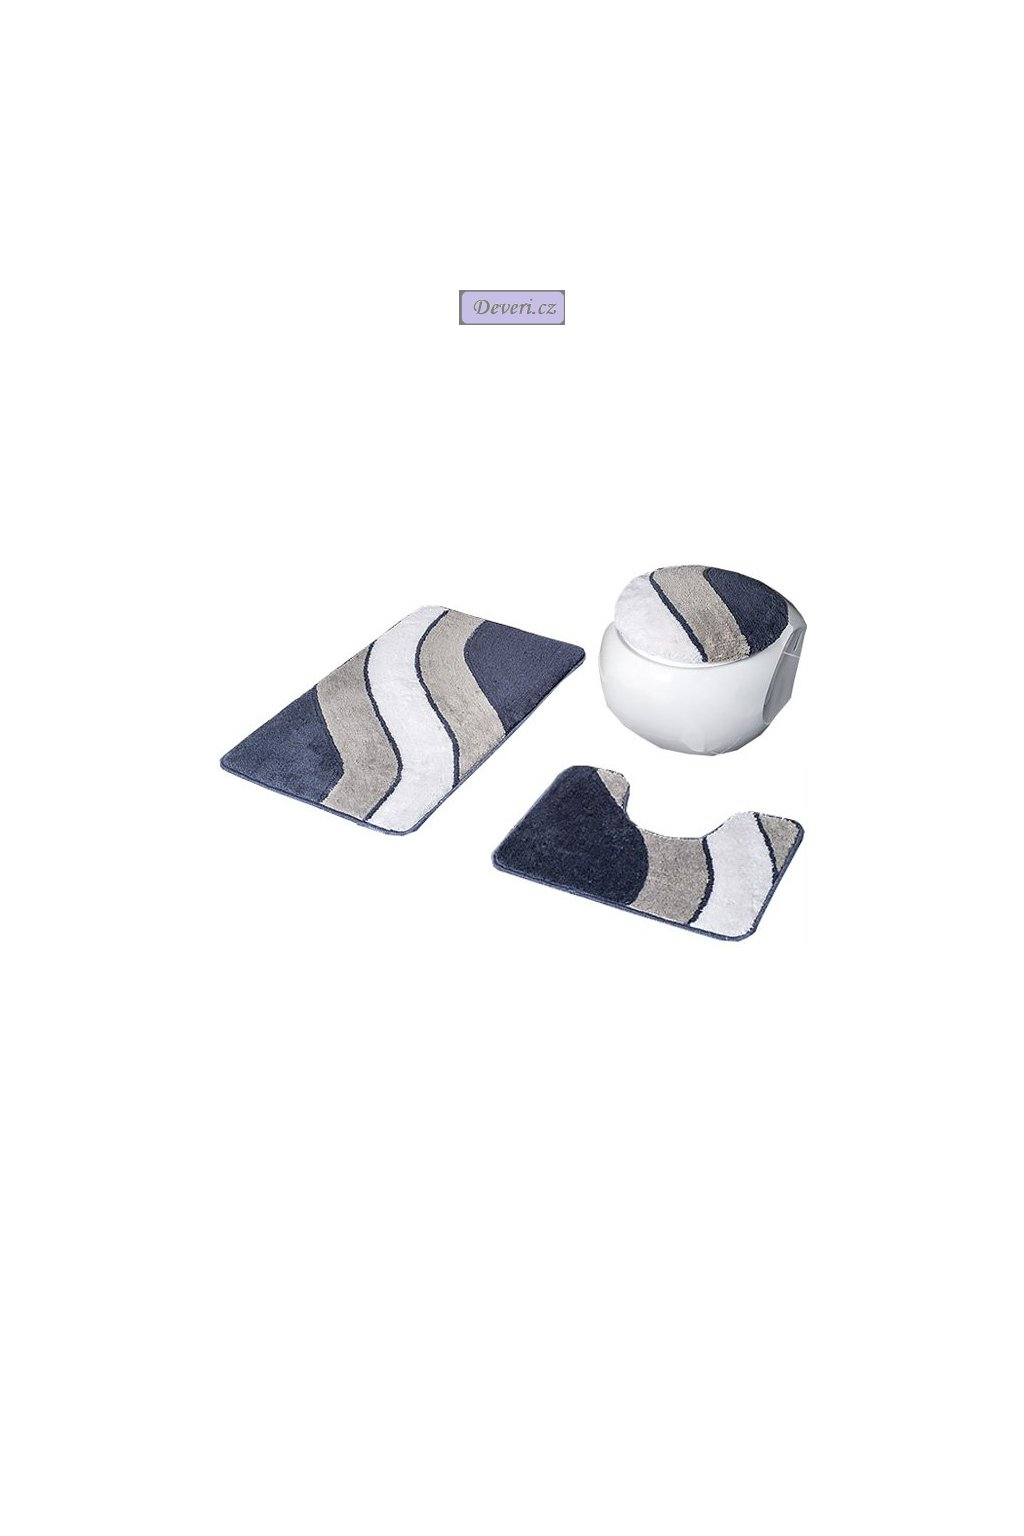 Koupelnové koberečky Sada/ VARIANT 3 kusy různé barvy 50x70cm / 50x35cm/ 46x48cm